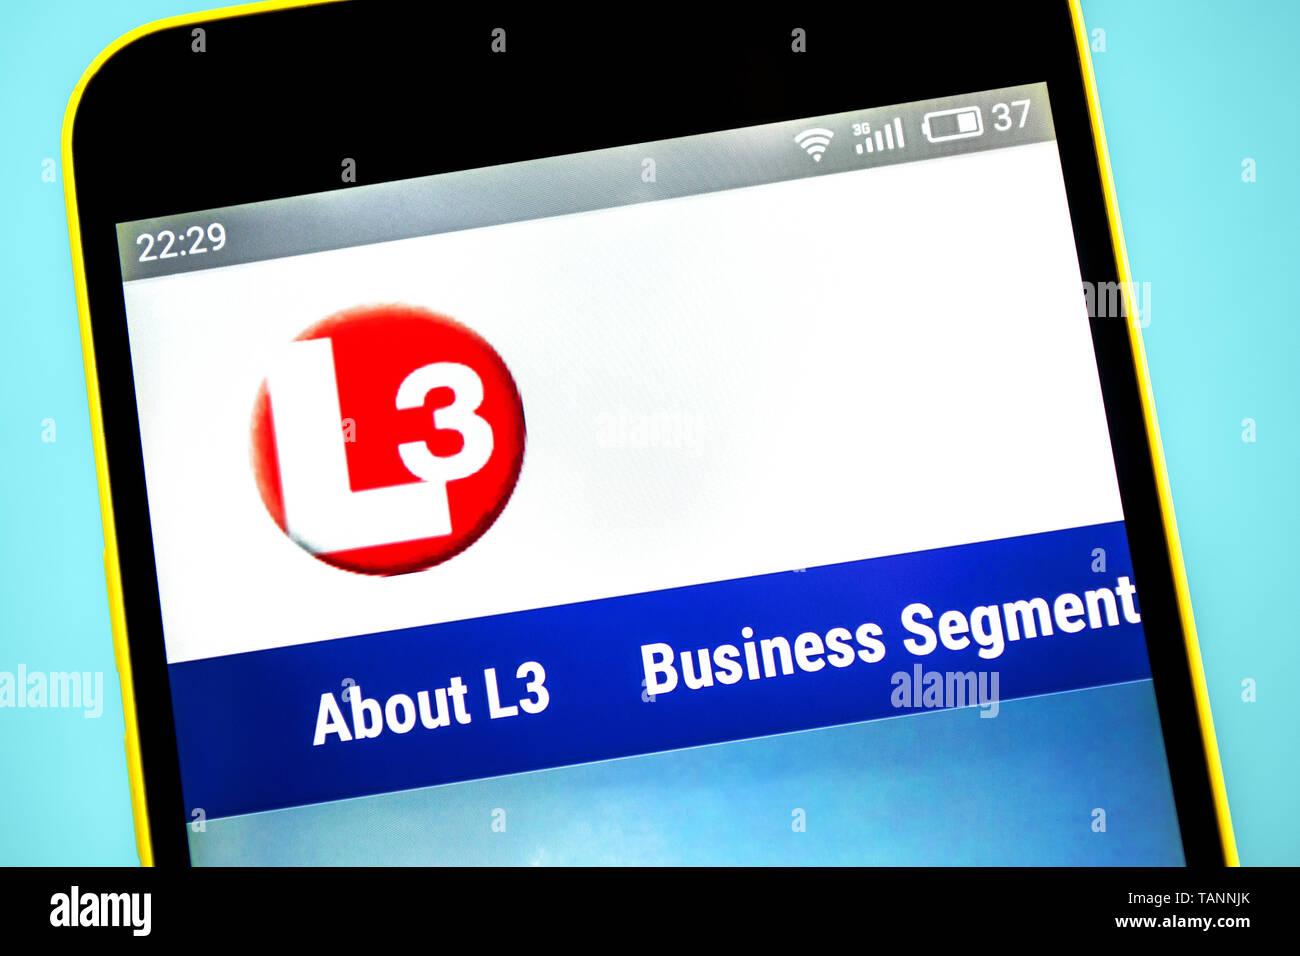 Berdyansk, Ukraine - 23 May 2019: L3 Technologies aerospace website homepage. L3 Technologies logo visible on the phone screen Stock Photo